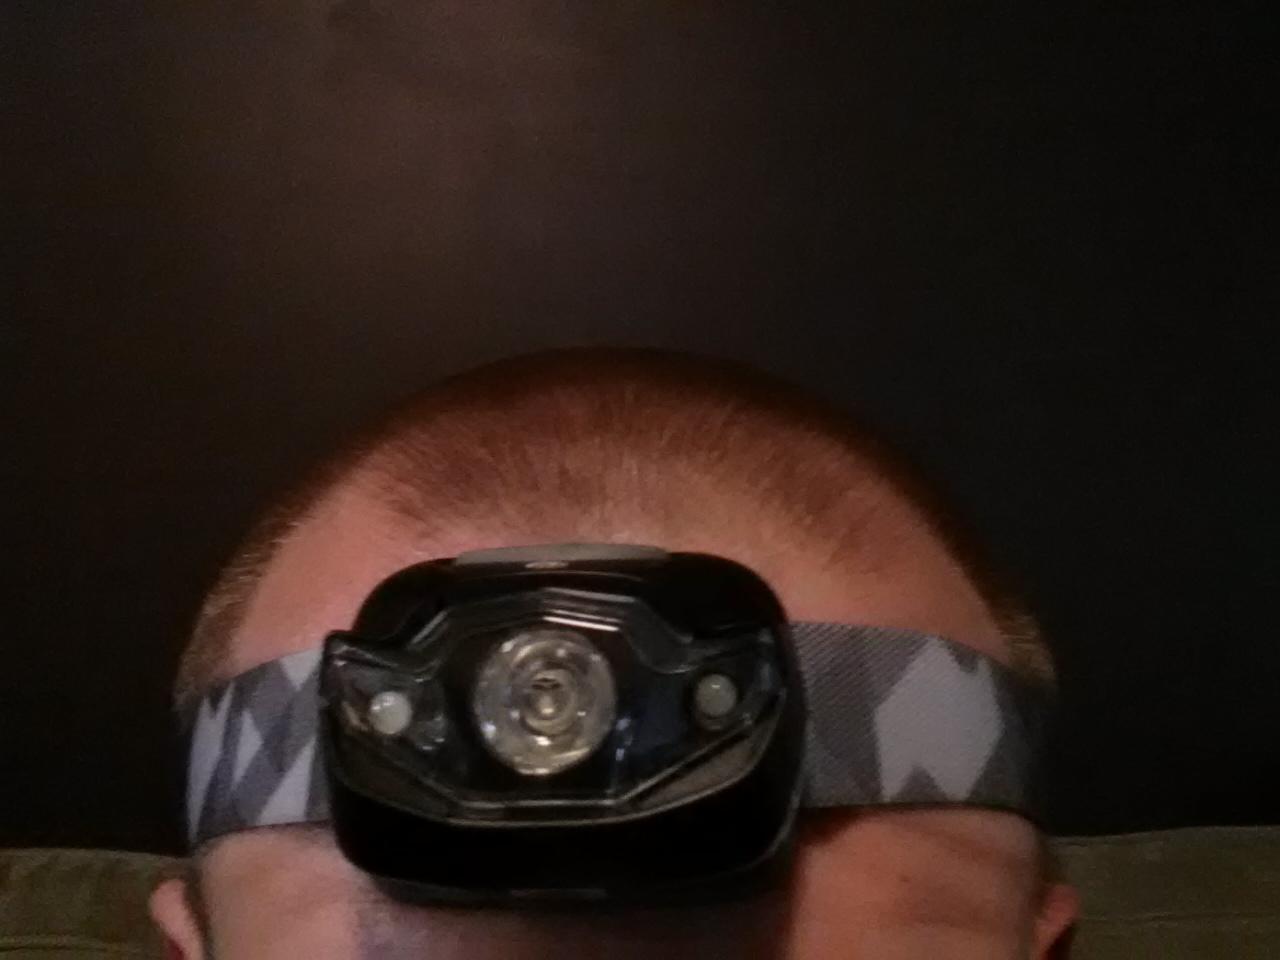 Northbound Train Ultra Bright LED Headlamp Flashlight Review